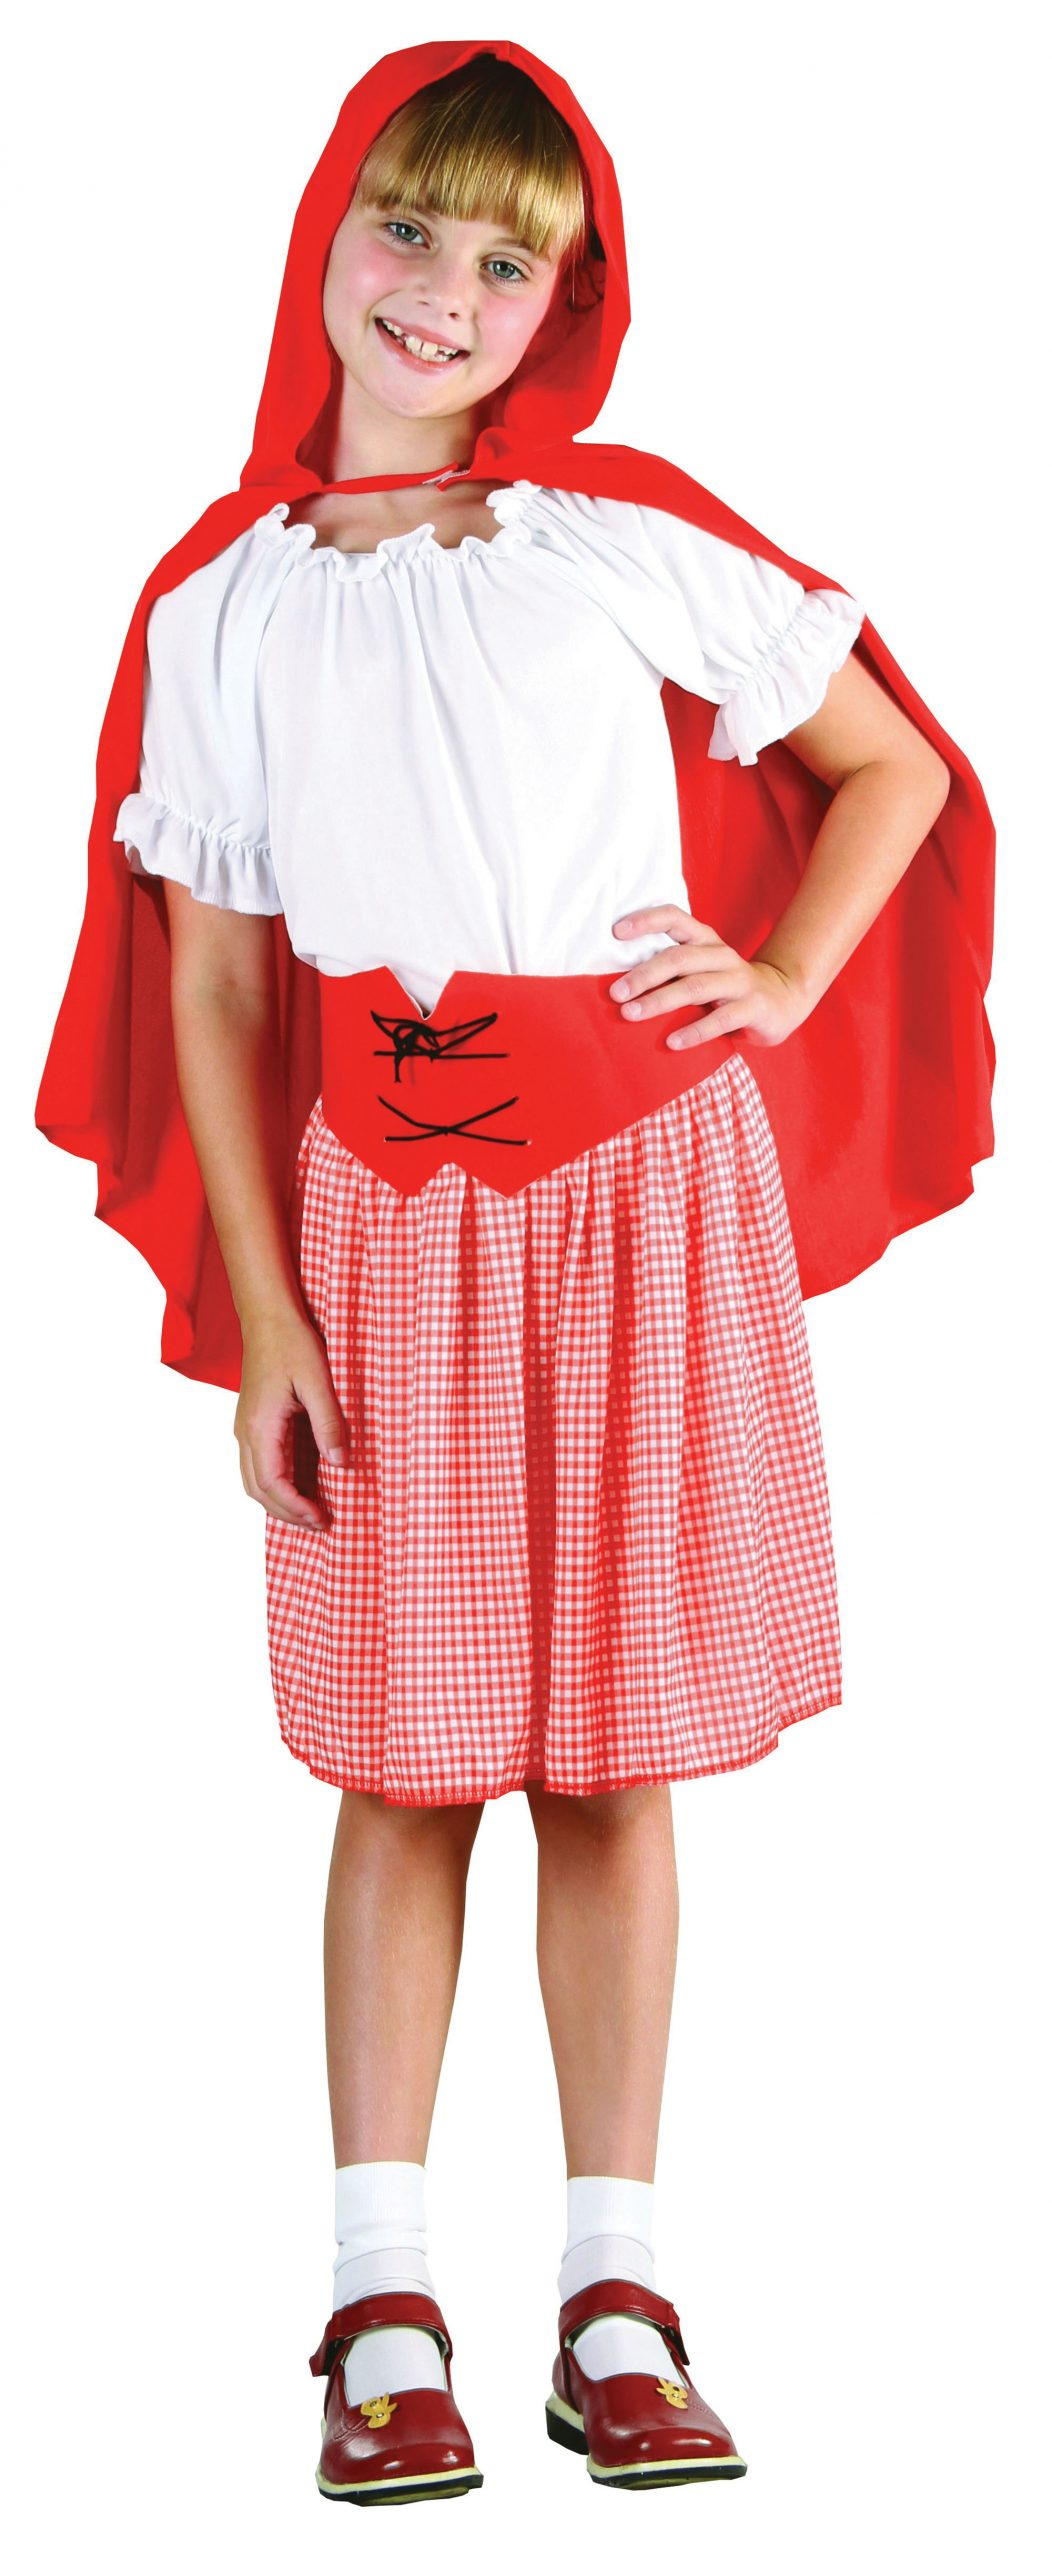 GIRLS/TV & FILM/Red Riding Hood - Kids